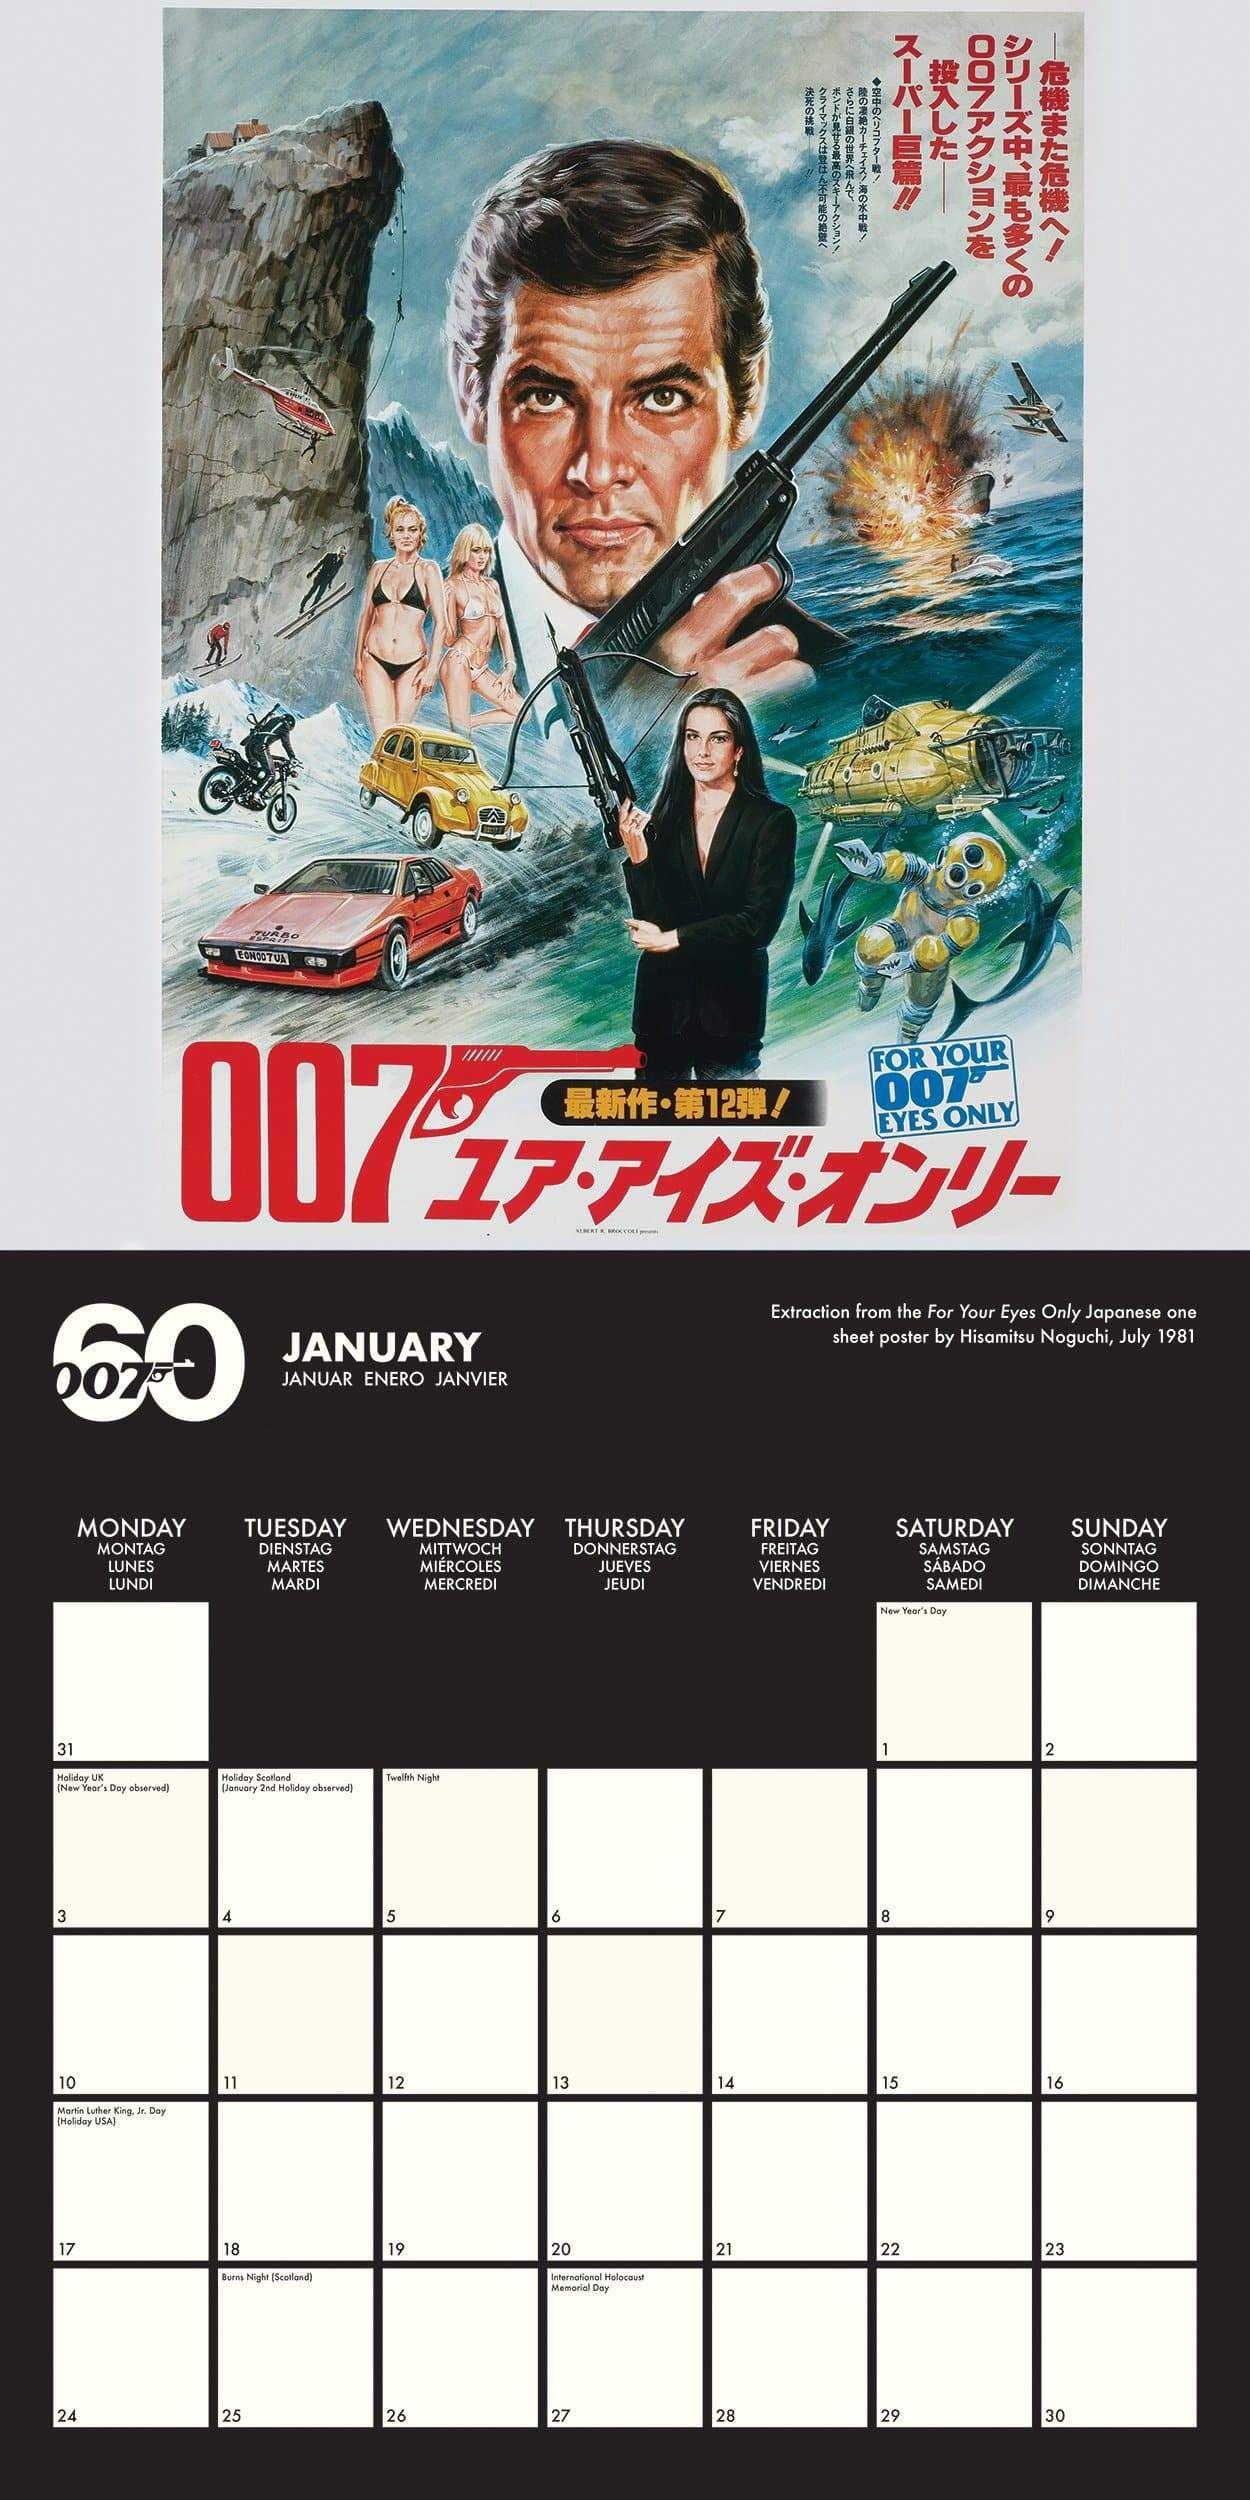 James Bond 2022 Calendar - 60th Anniversary Edition (Pre-order)